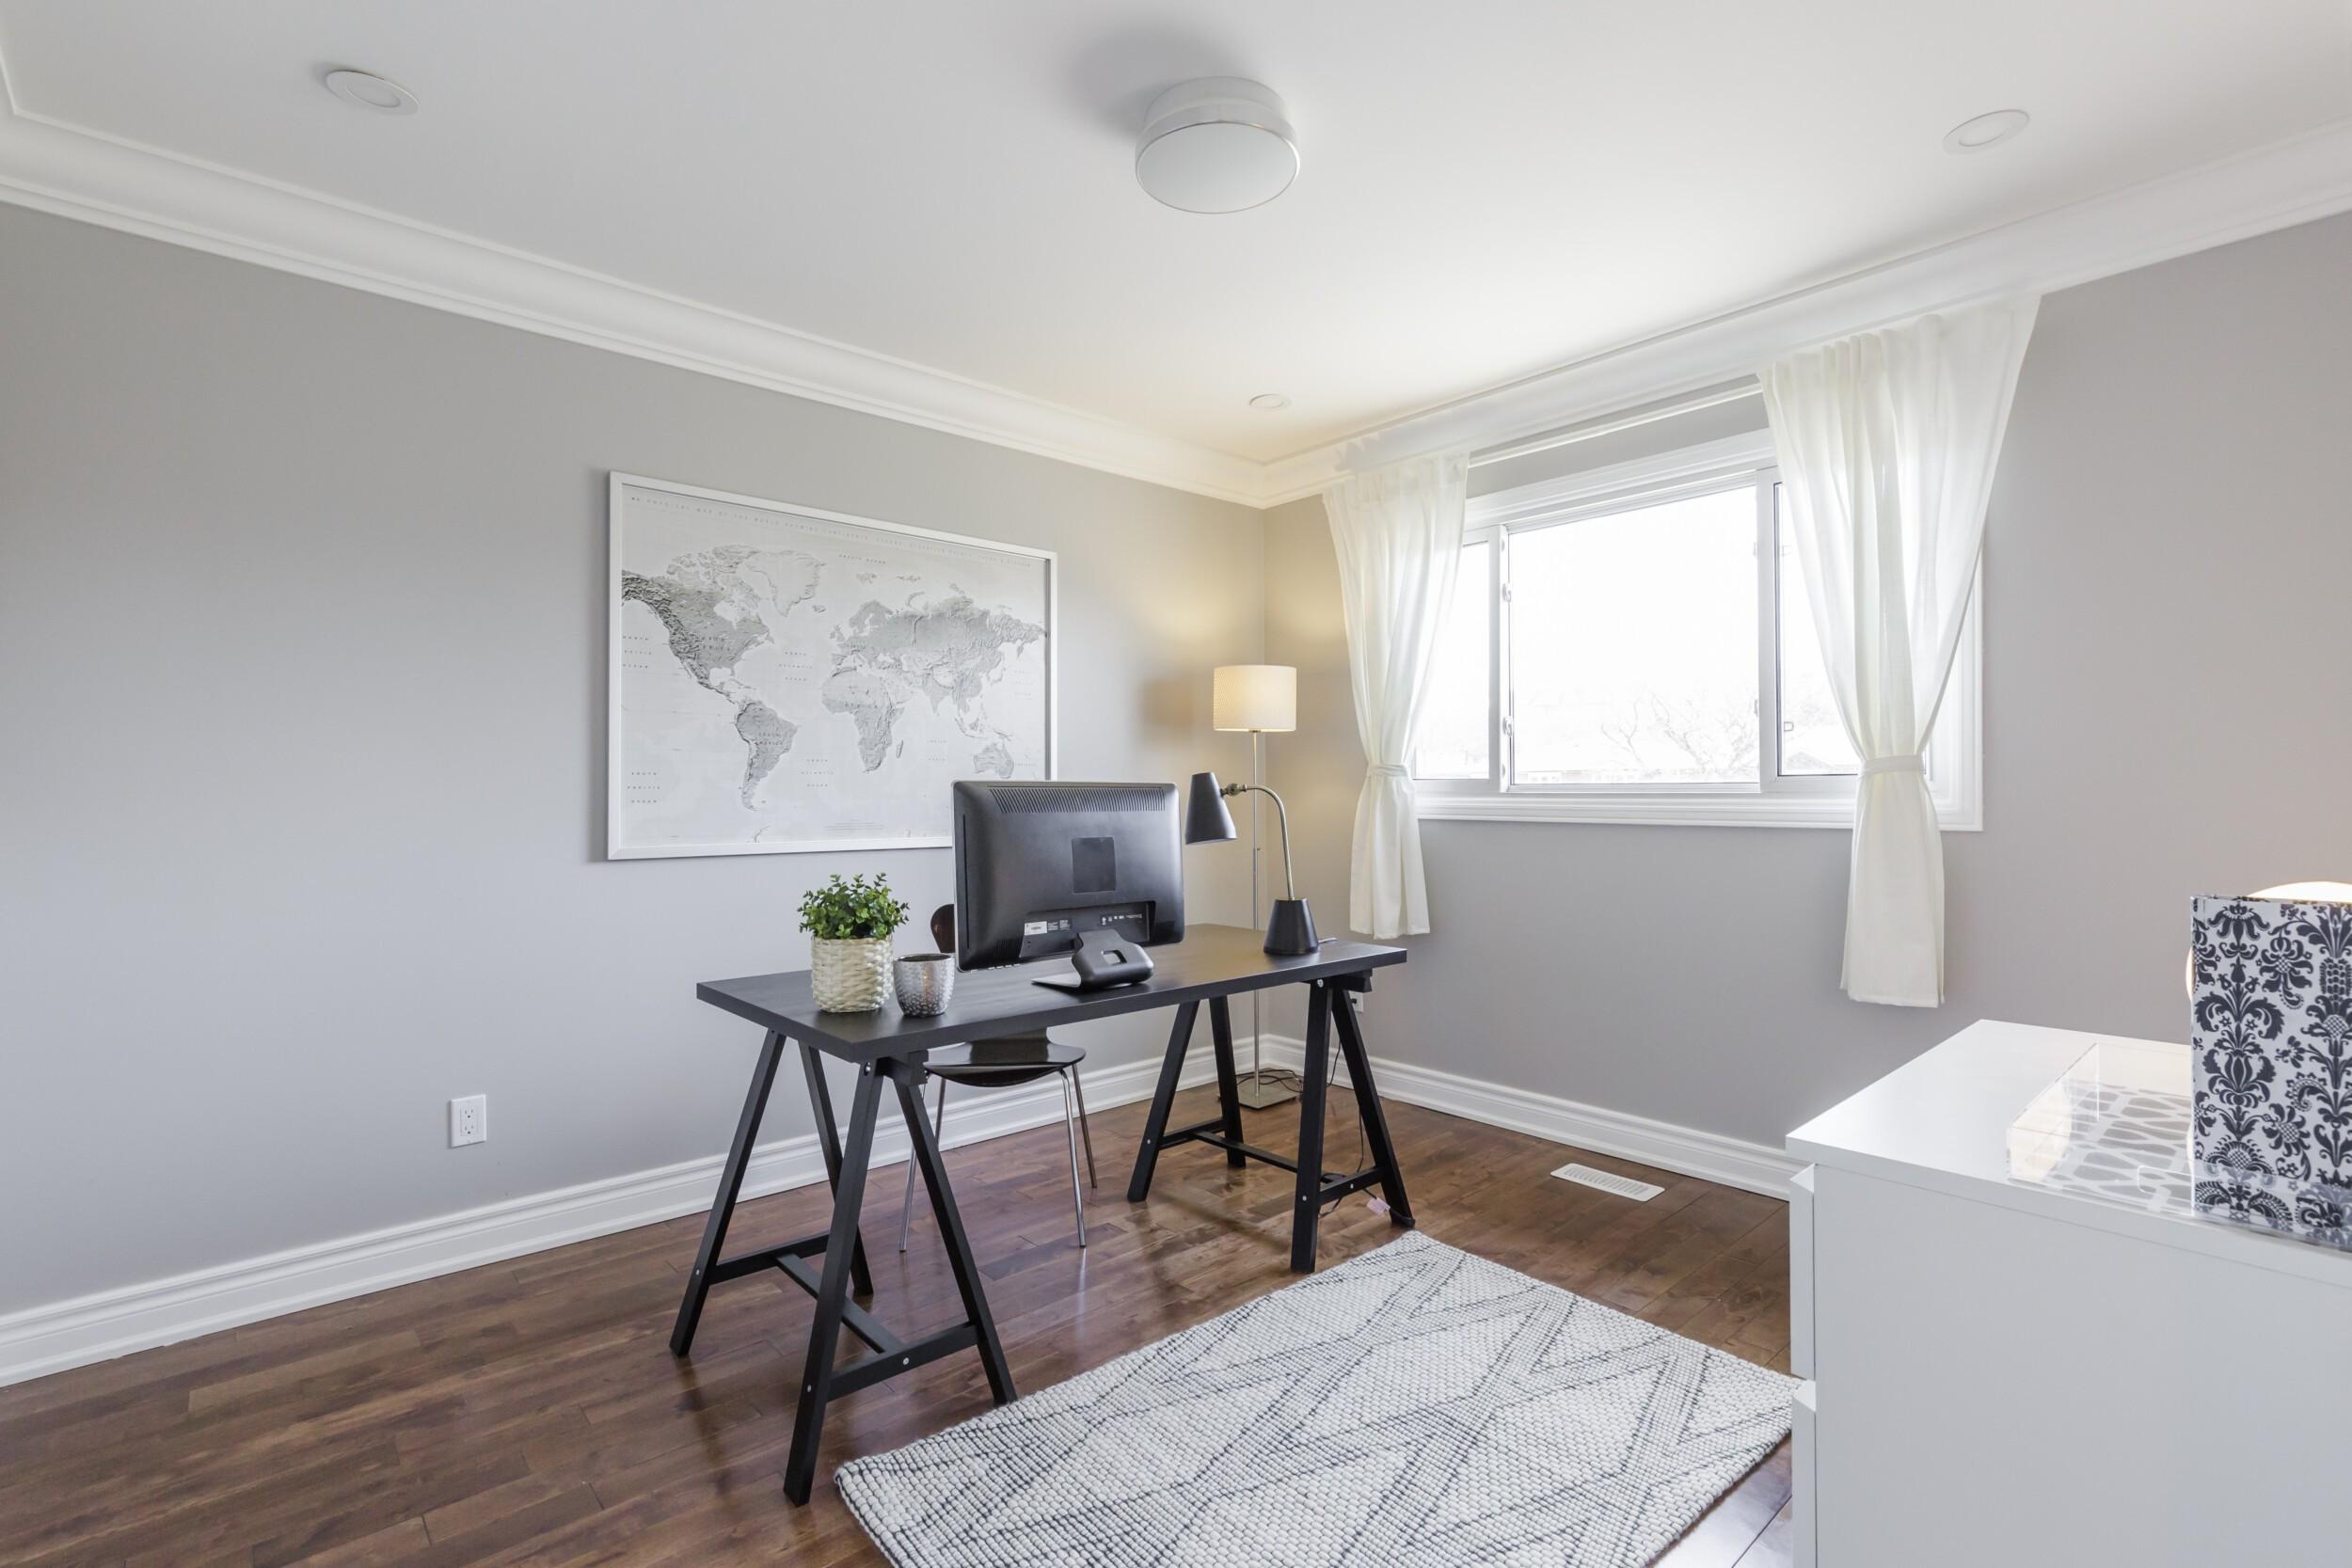 New Office Room Interior in North America